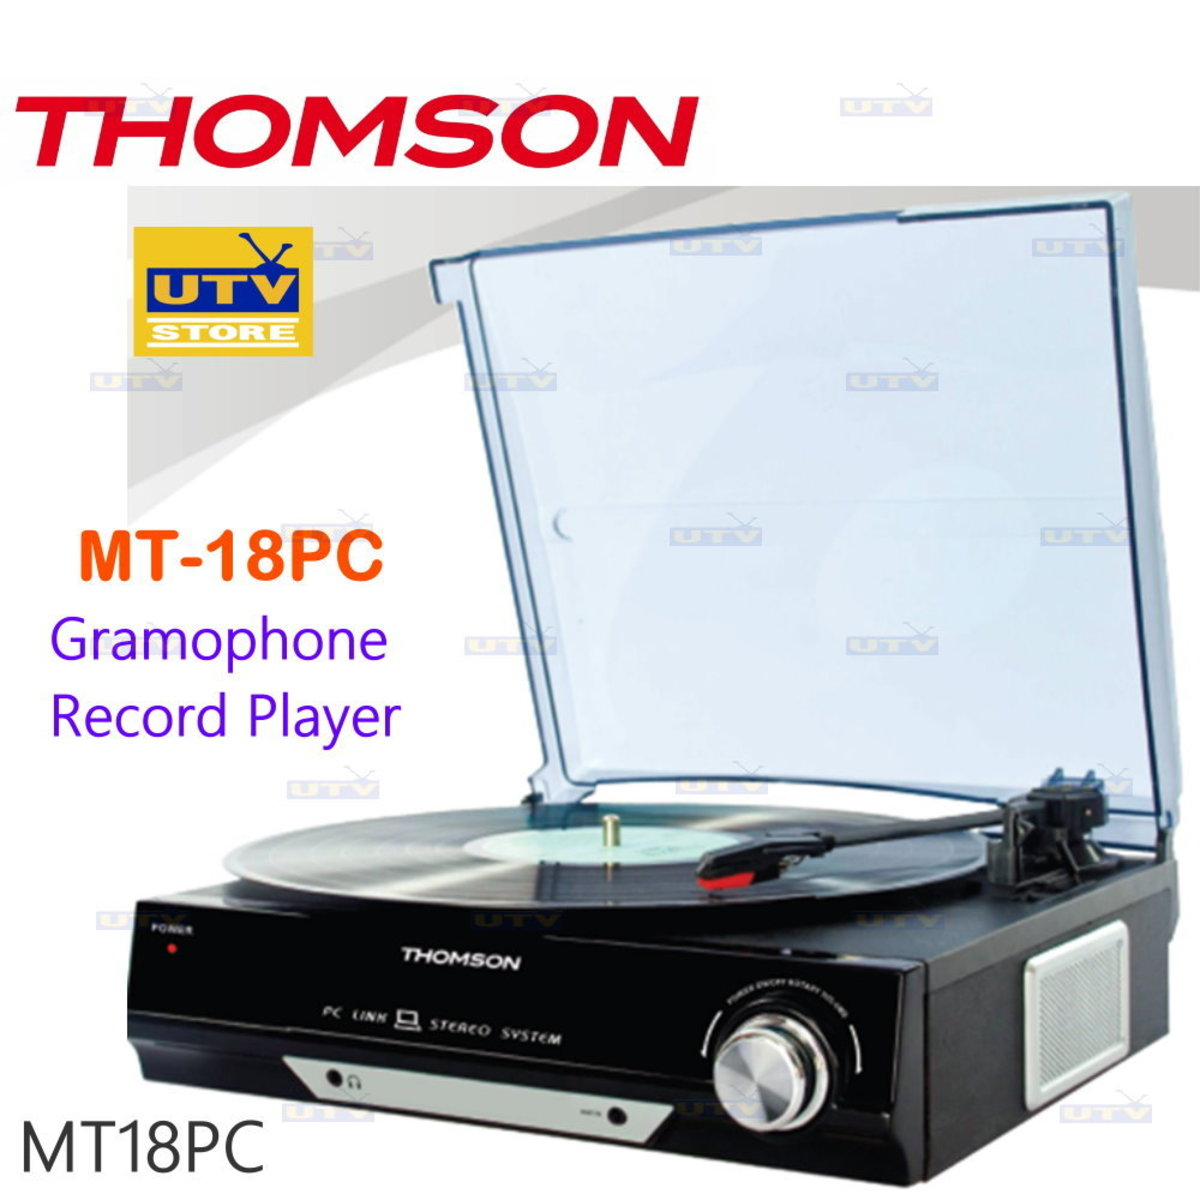 MT-18PC Gramophone Record Player